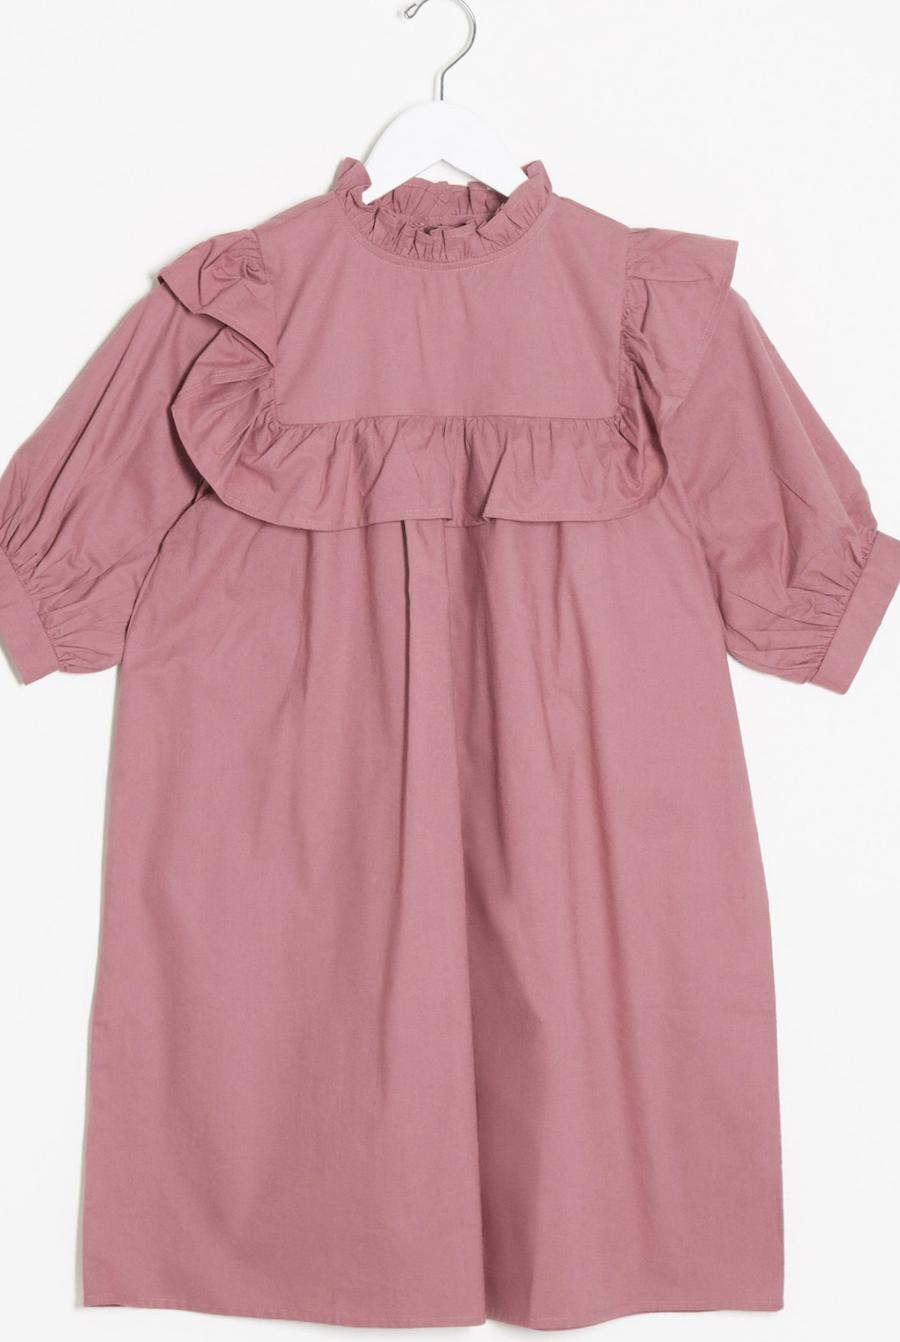 Vestido amplio con detalle de volantes en rosa sombra de Influence